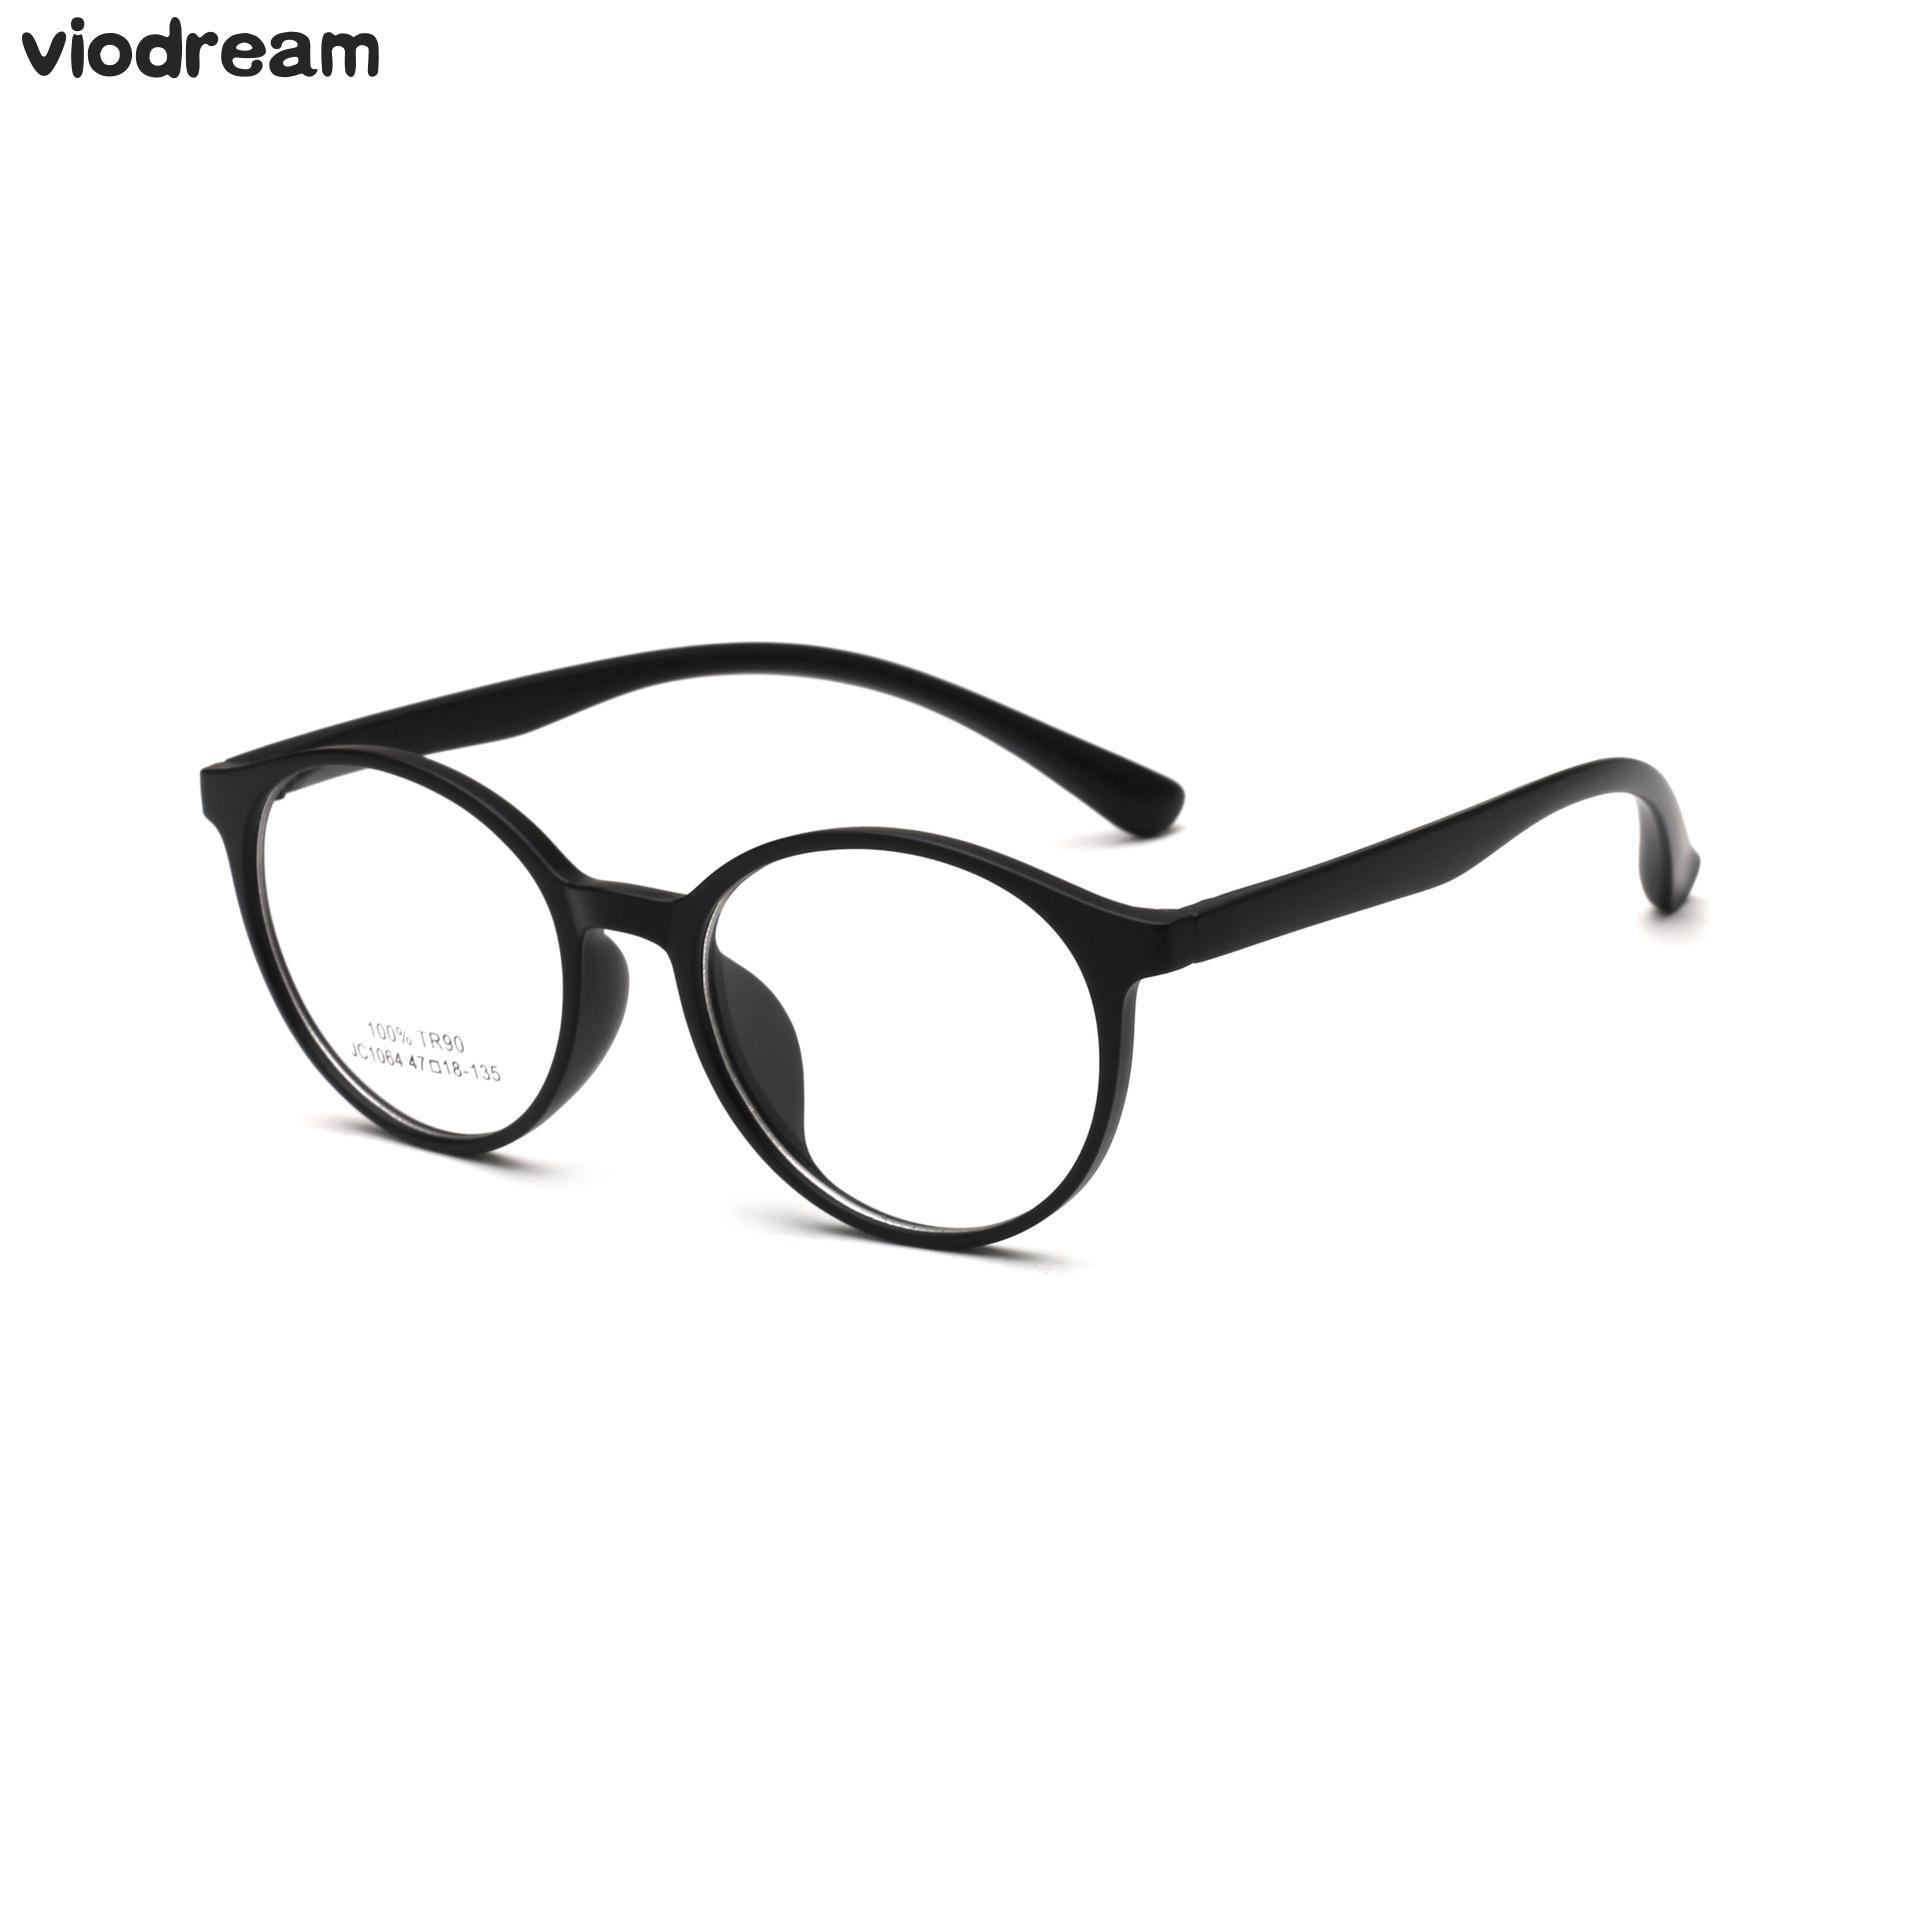 63844e45ee Aliexpress.com   Buy Viodream Retro Tr90 Big Box Round Glasses Frame 10 14  Years old boy girl Prescription Eyewear Spectacle Frame Oculos De Grau from  ...